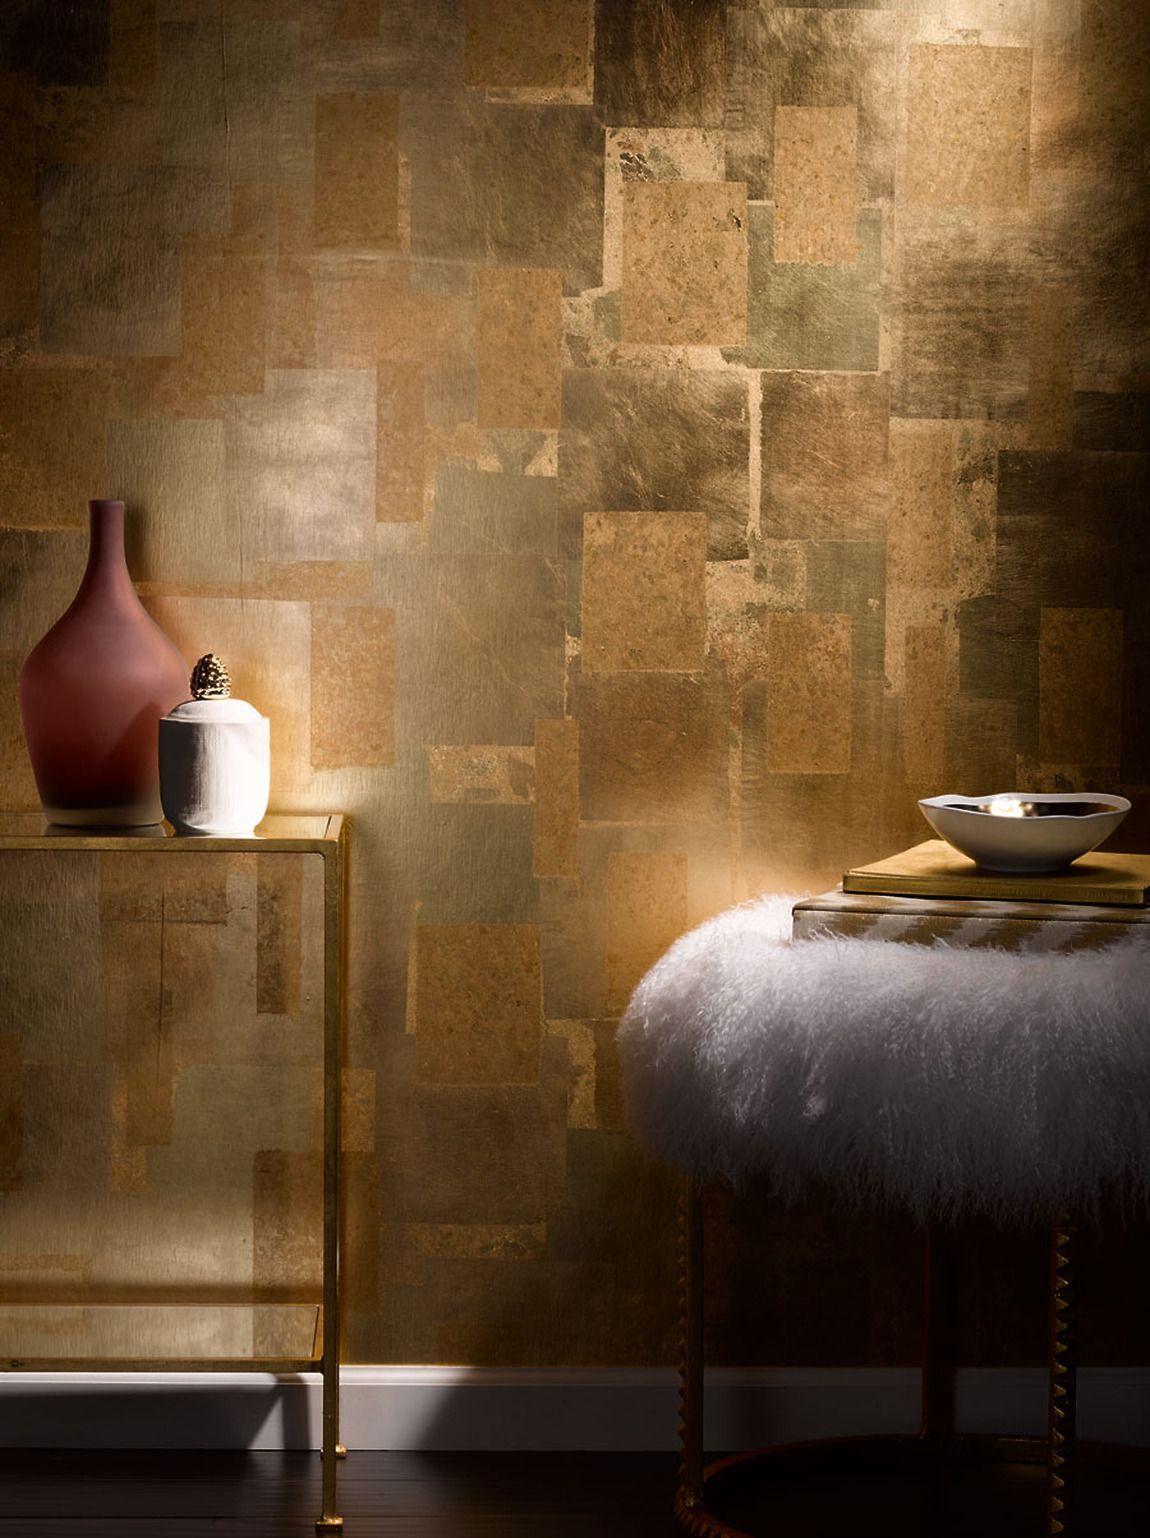 Glow Oxidized Leaf Wallpaper by Phillip Jeffries I think